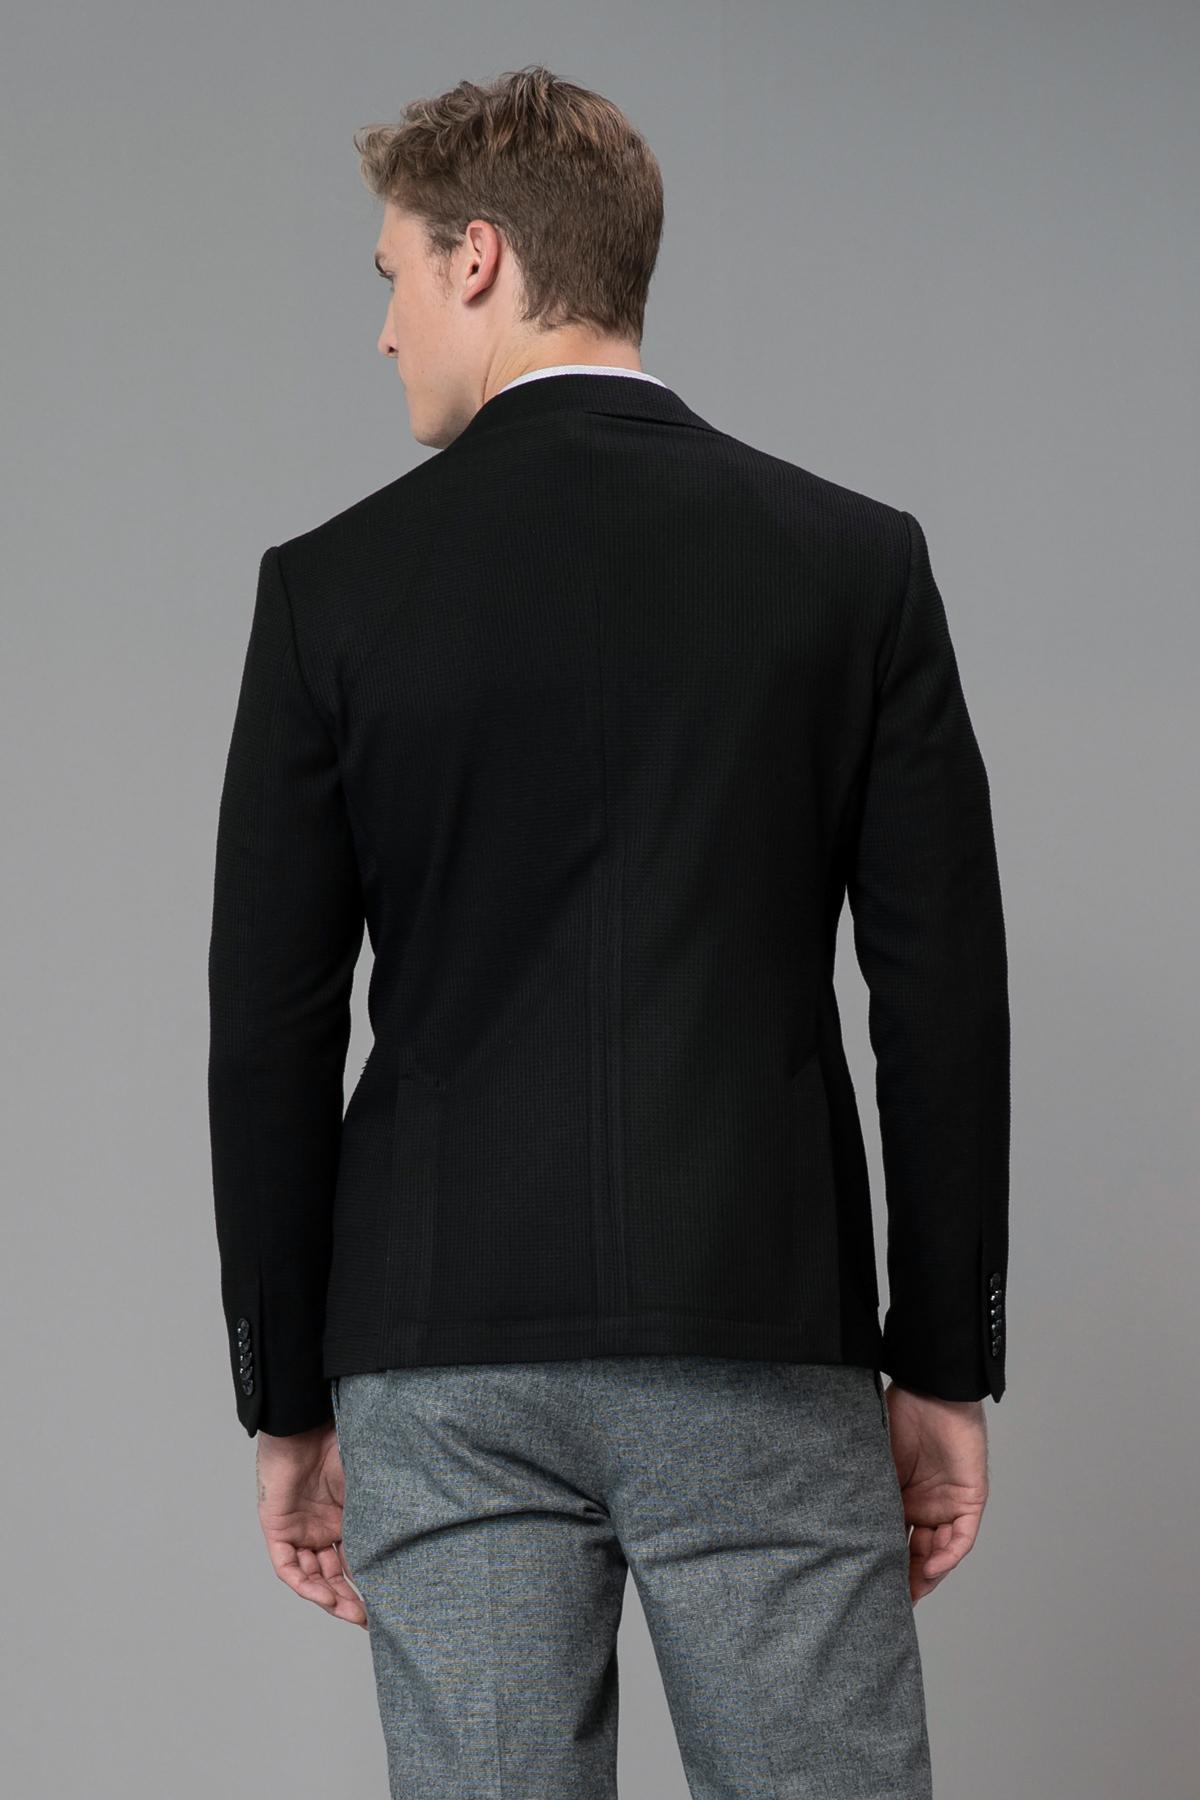 Nox Spor Blazer Ceket Slim Fit Siyah